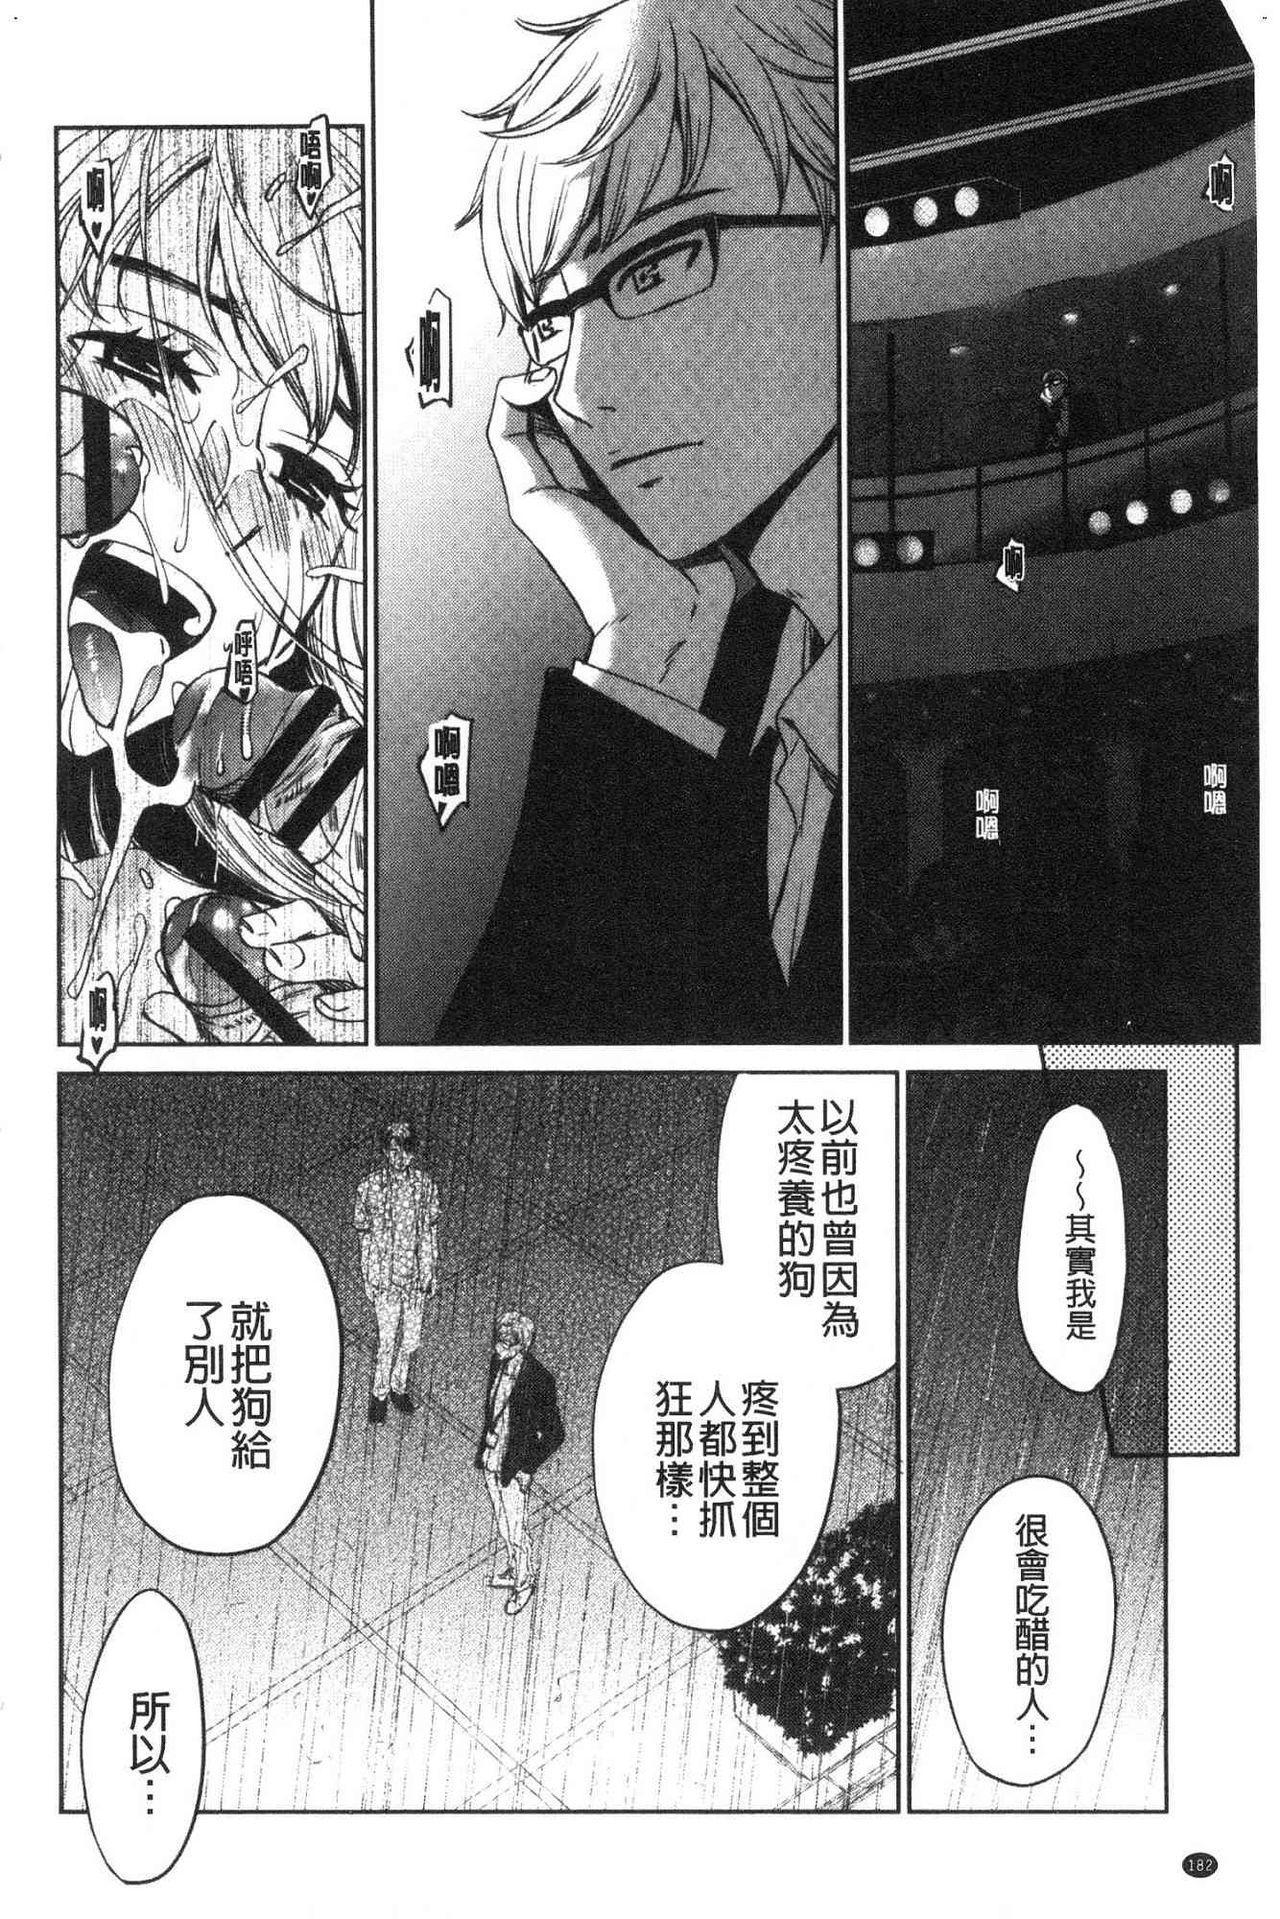 [Gotoh Akira]  21-ji no Onna ~Camera no Mae no Mesuinu~ 2 | 21時之女 ~鏡頭前的牝犬~ 2 [Chinese] 183